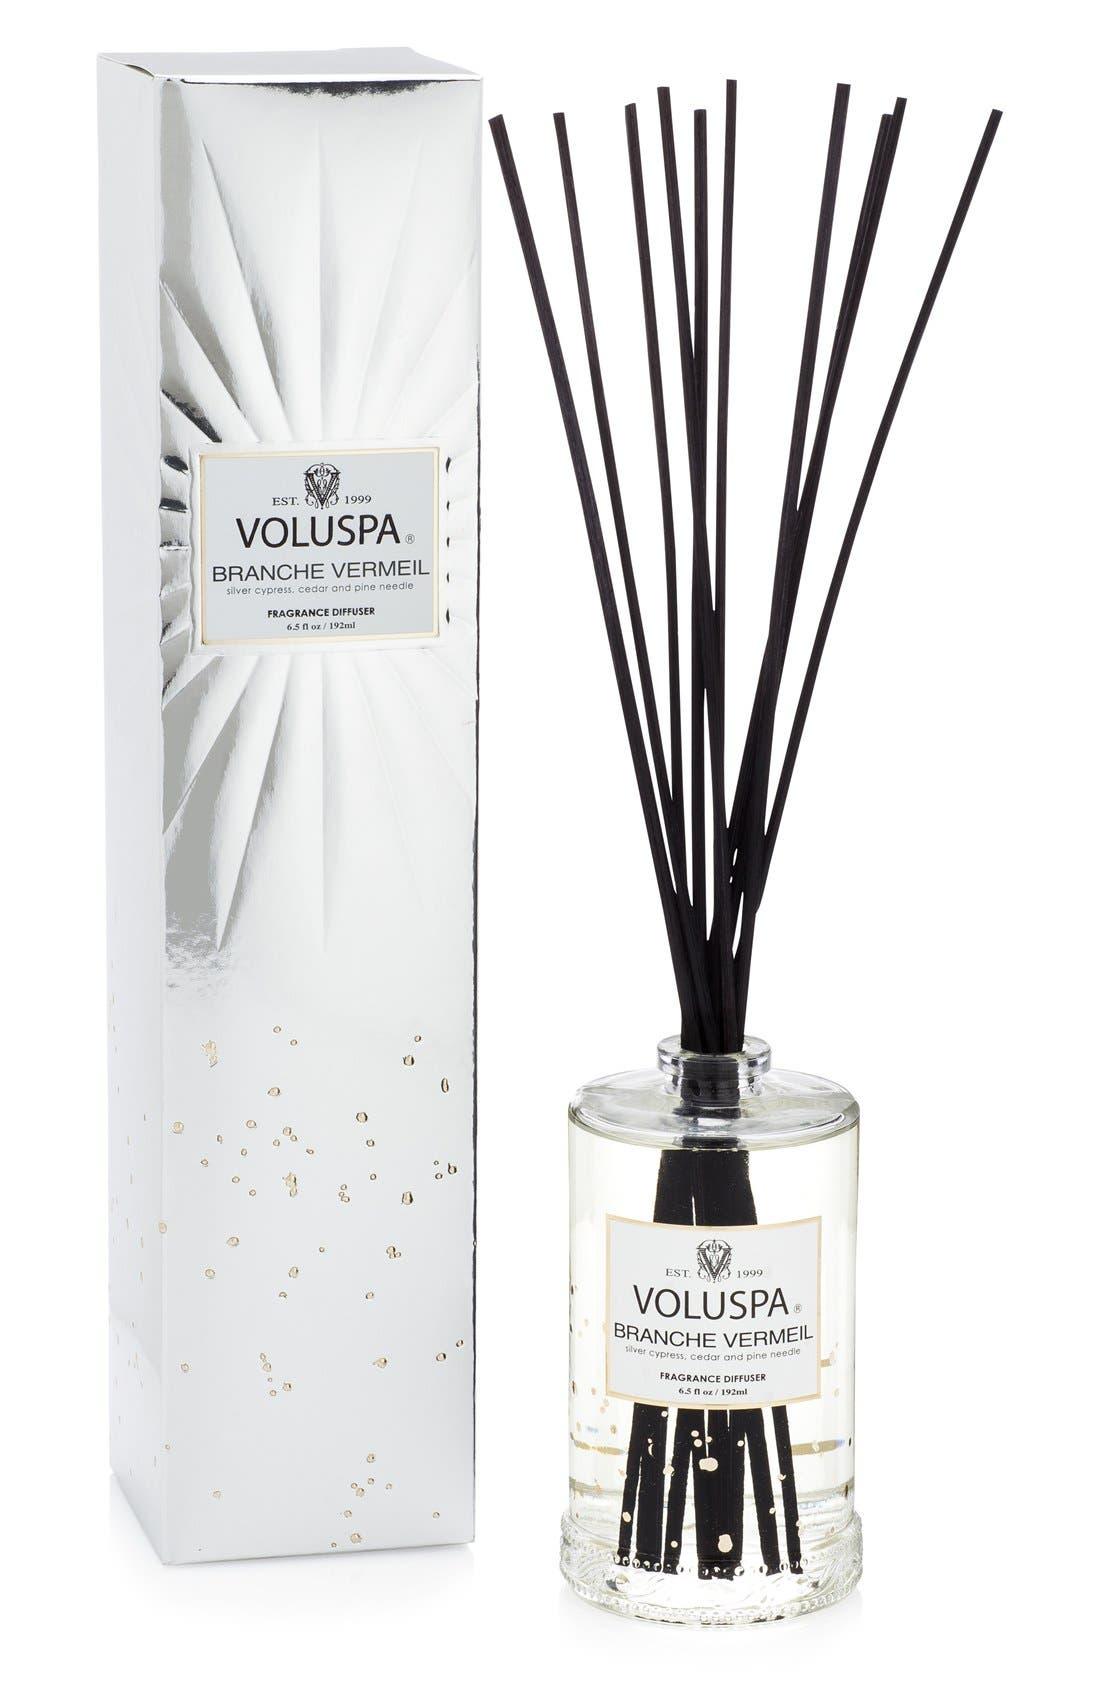 Alternate Image 1 Selected - Voluspa'Vermeil - Branche Vermeil' Home Ambience Diffuser